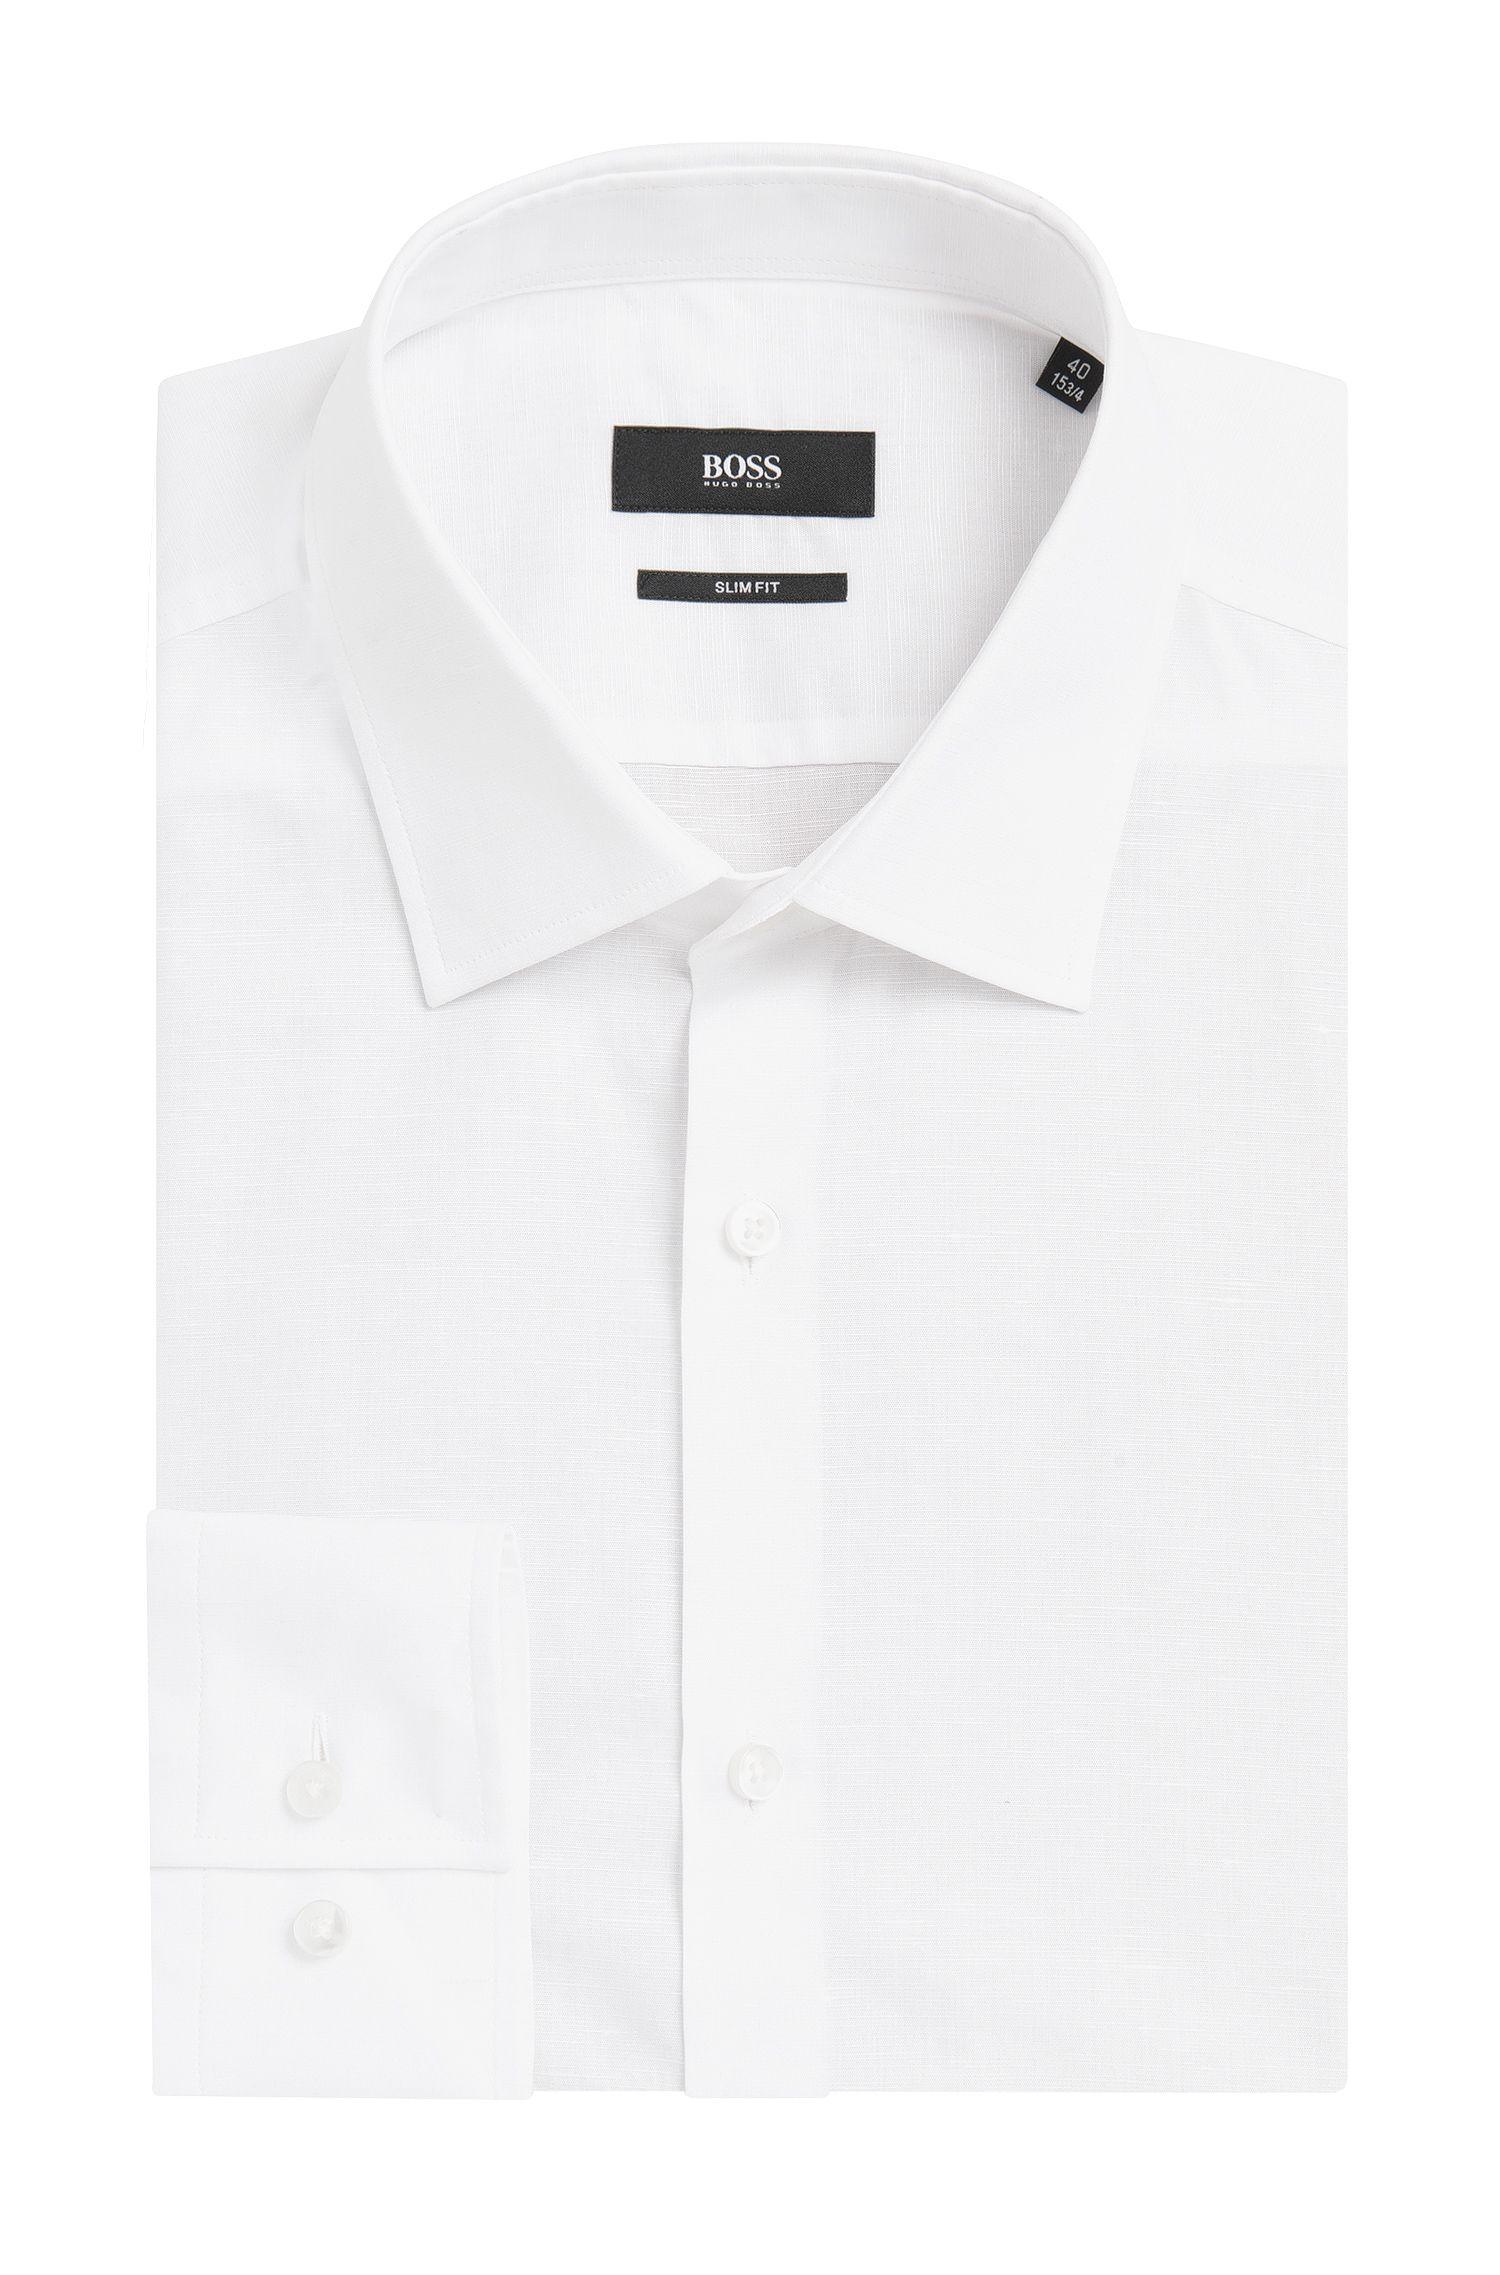 Italian Cotton Linen Dress Shirt, Slim Fit   Jenno